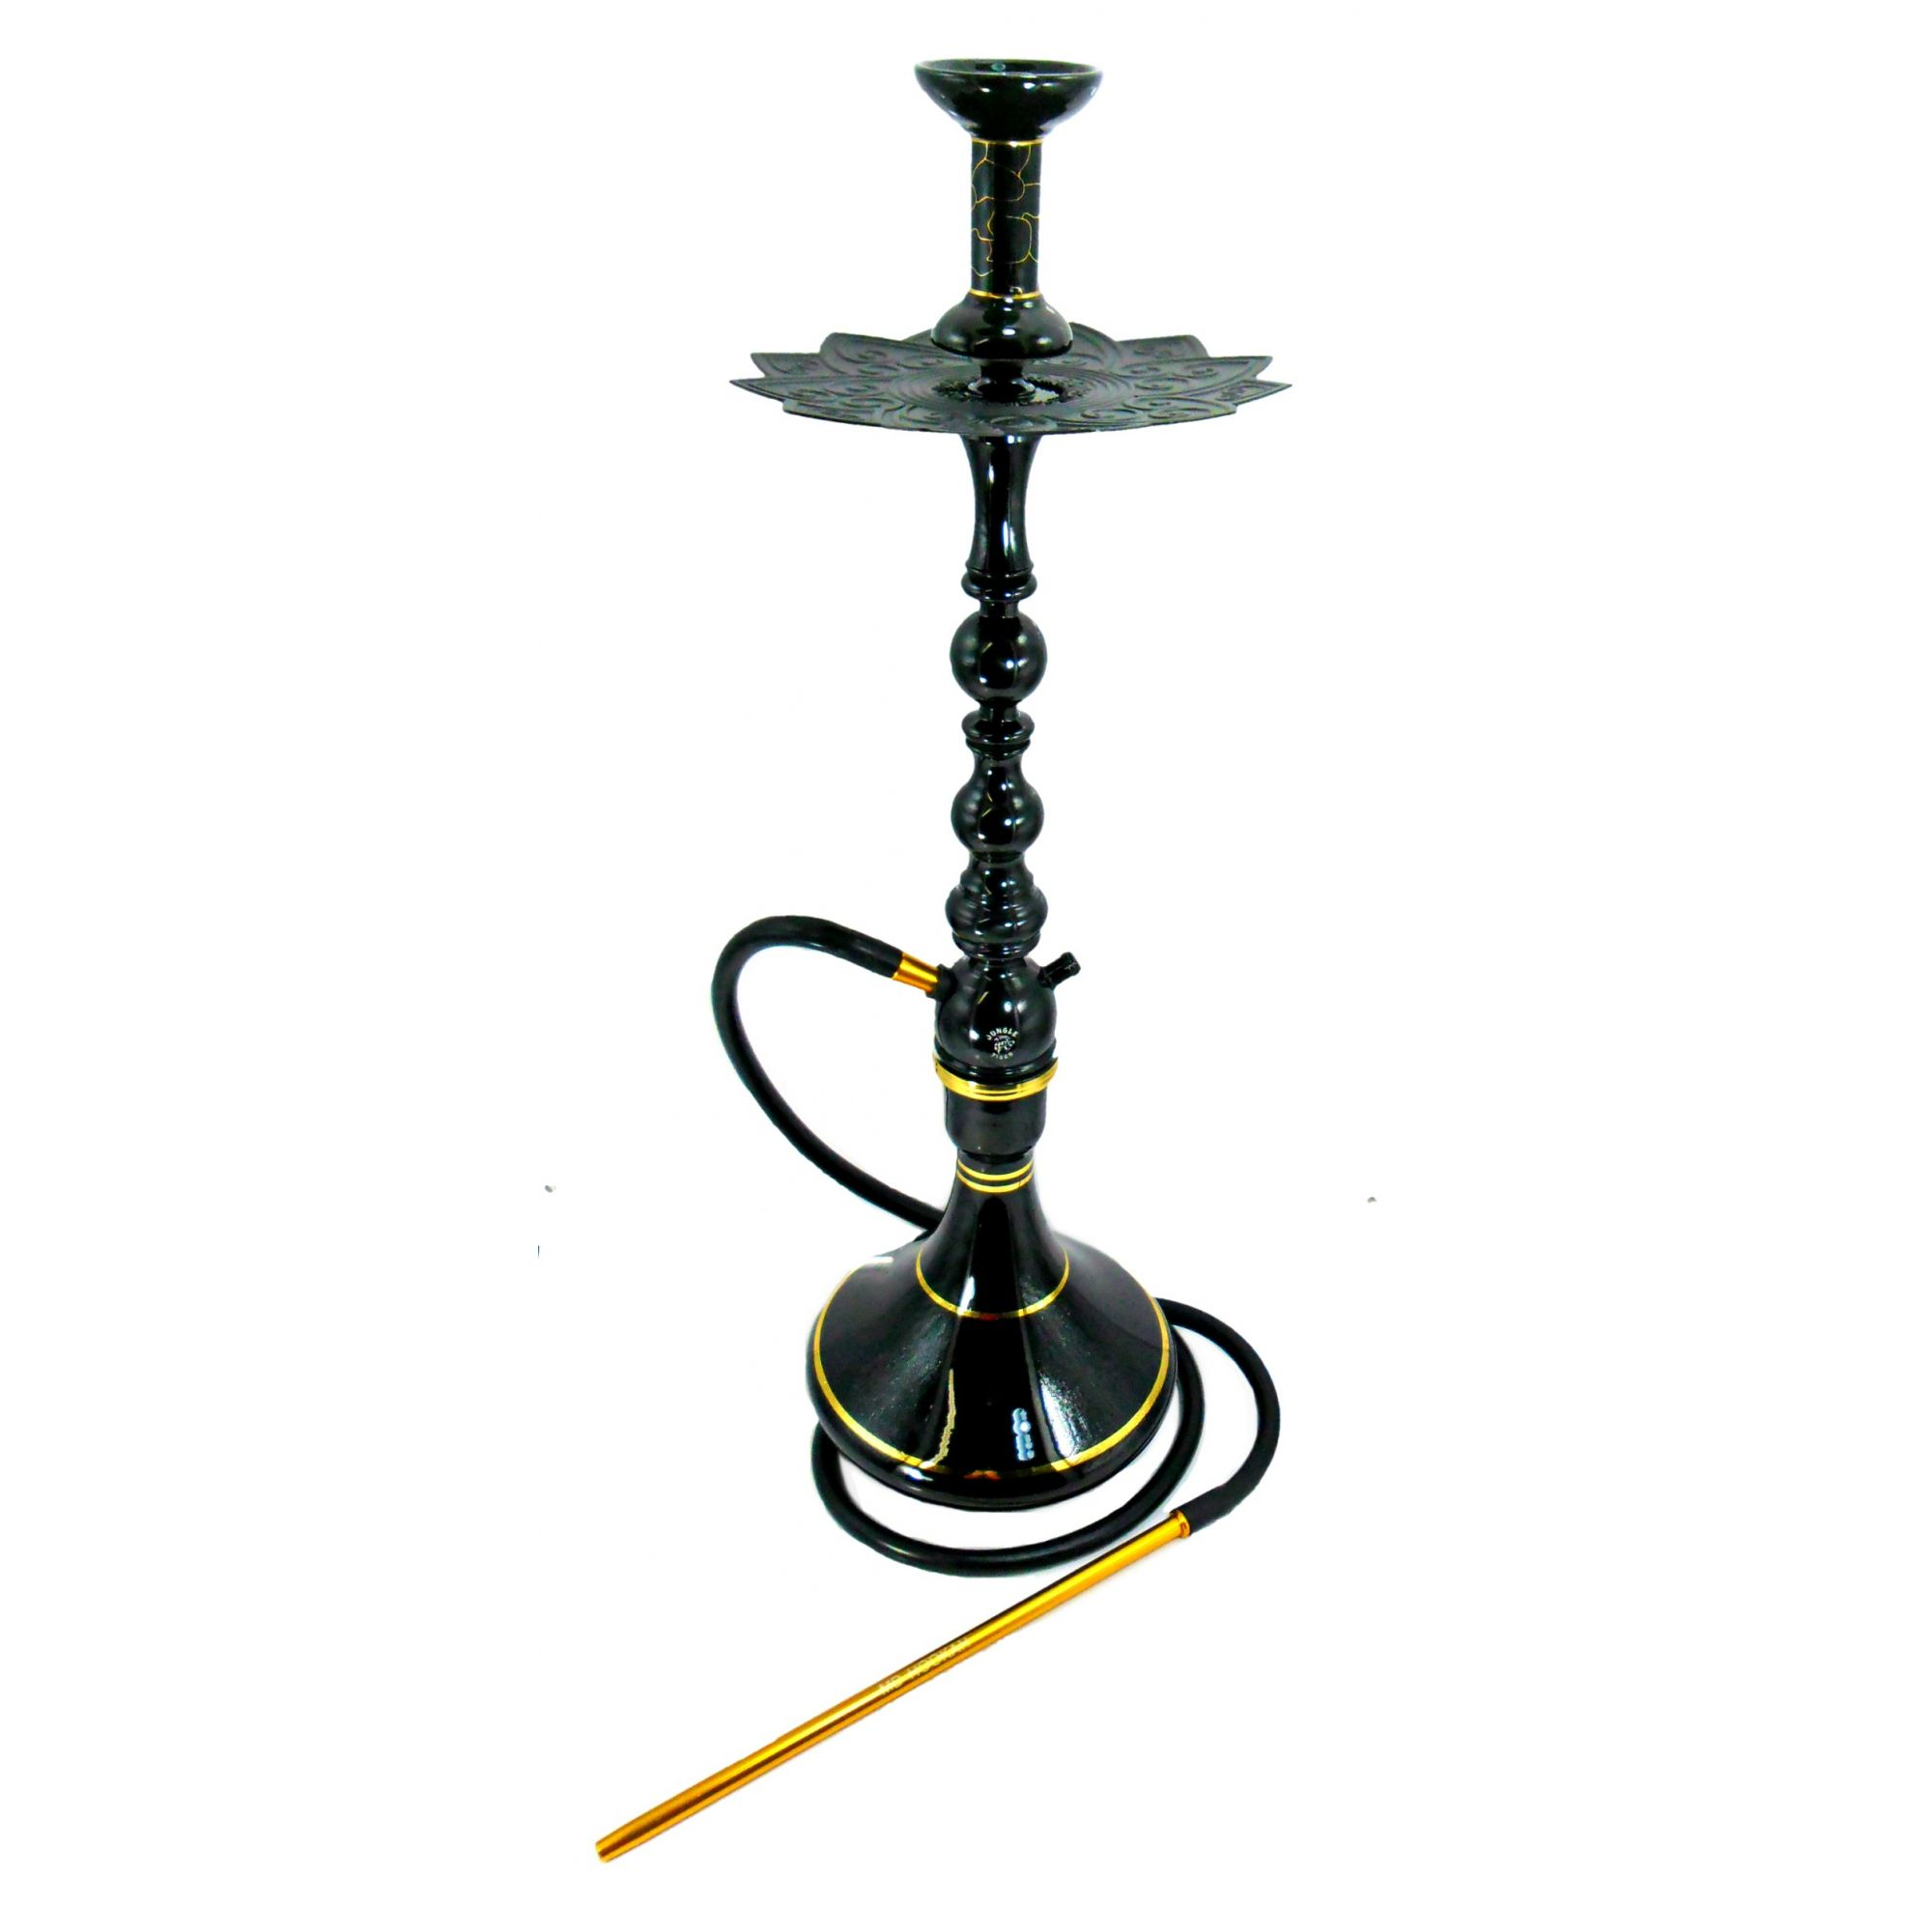 Narguile completo TIGER PRETO alumínio, dutado, híbrido (monte grande ou pequeno), vaso Aladin, mang. antichamas, 68cm.